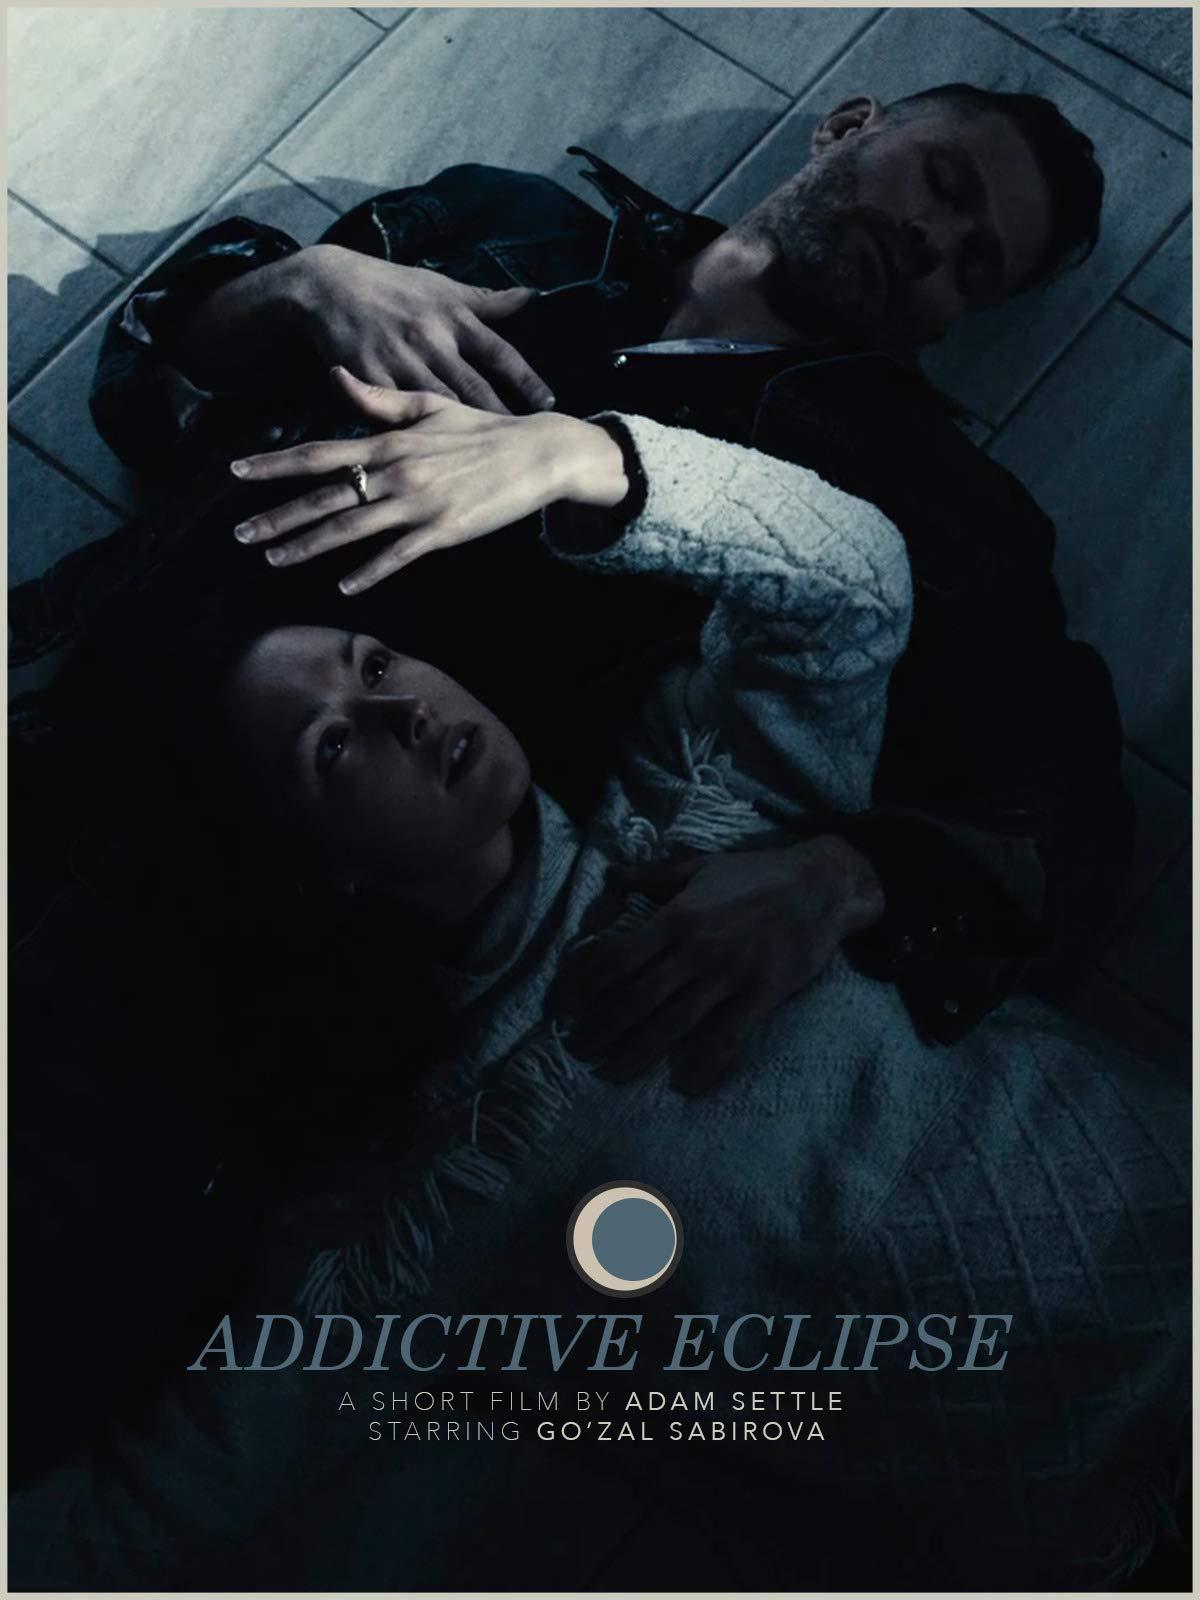 Addictive Eclipse